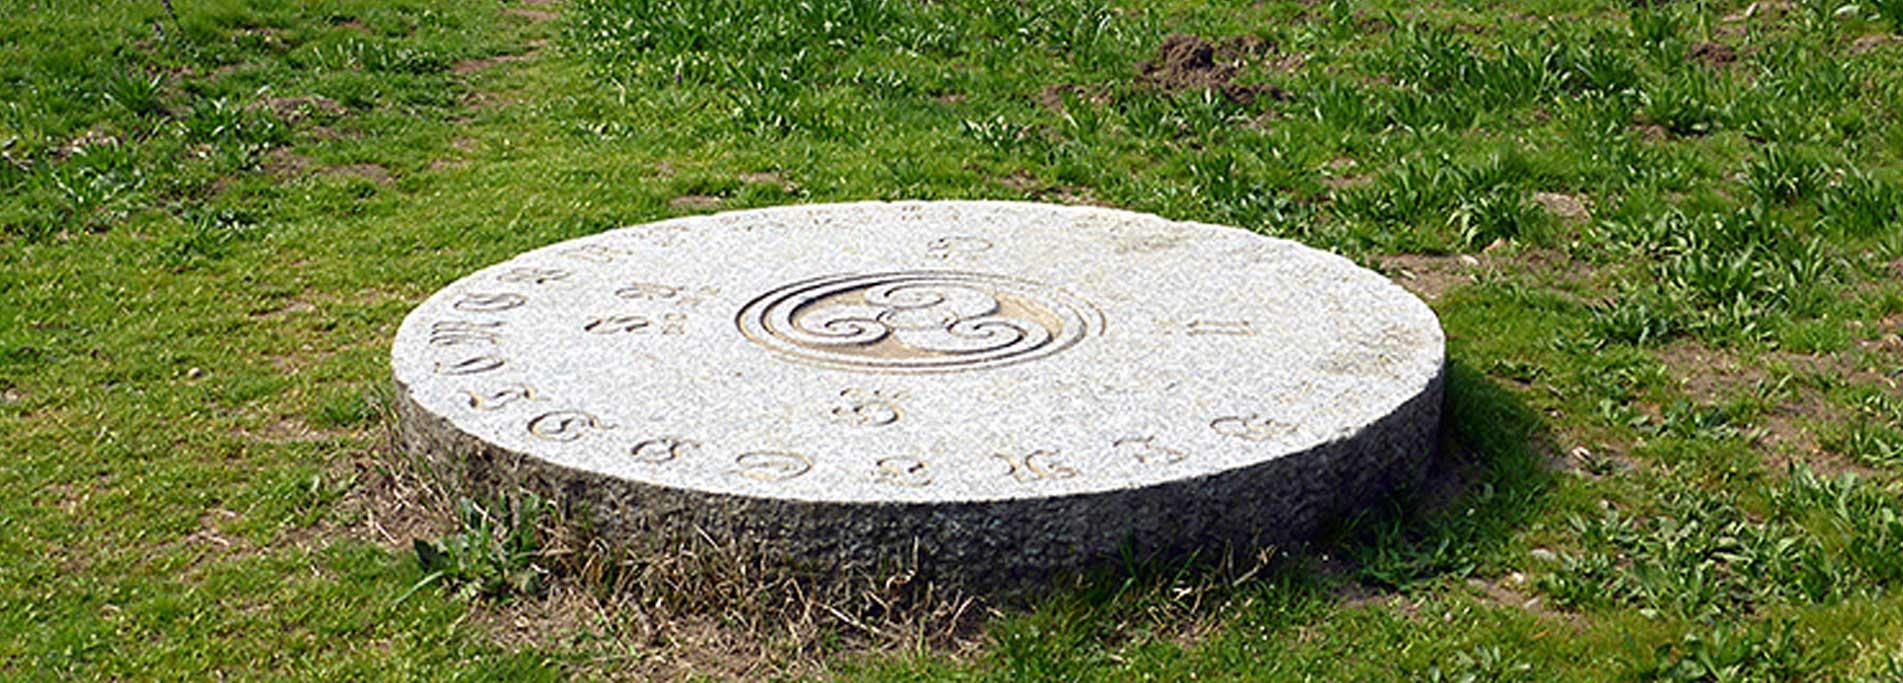 Calendario Celtico di Bernate